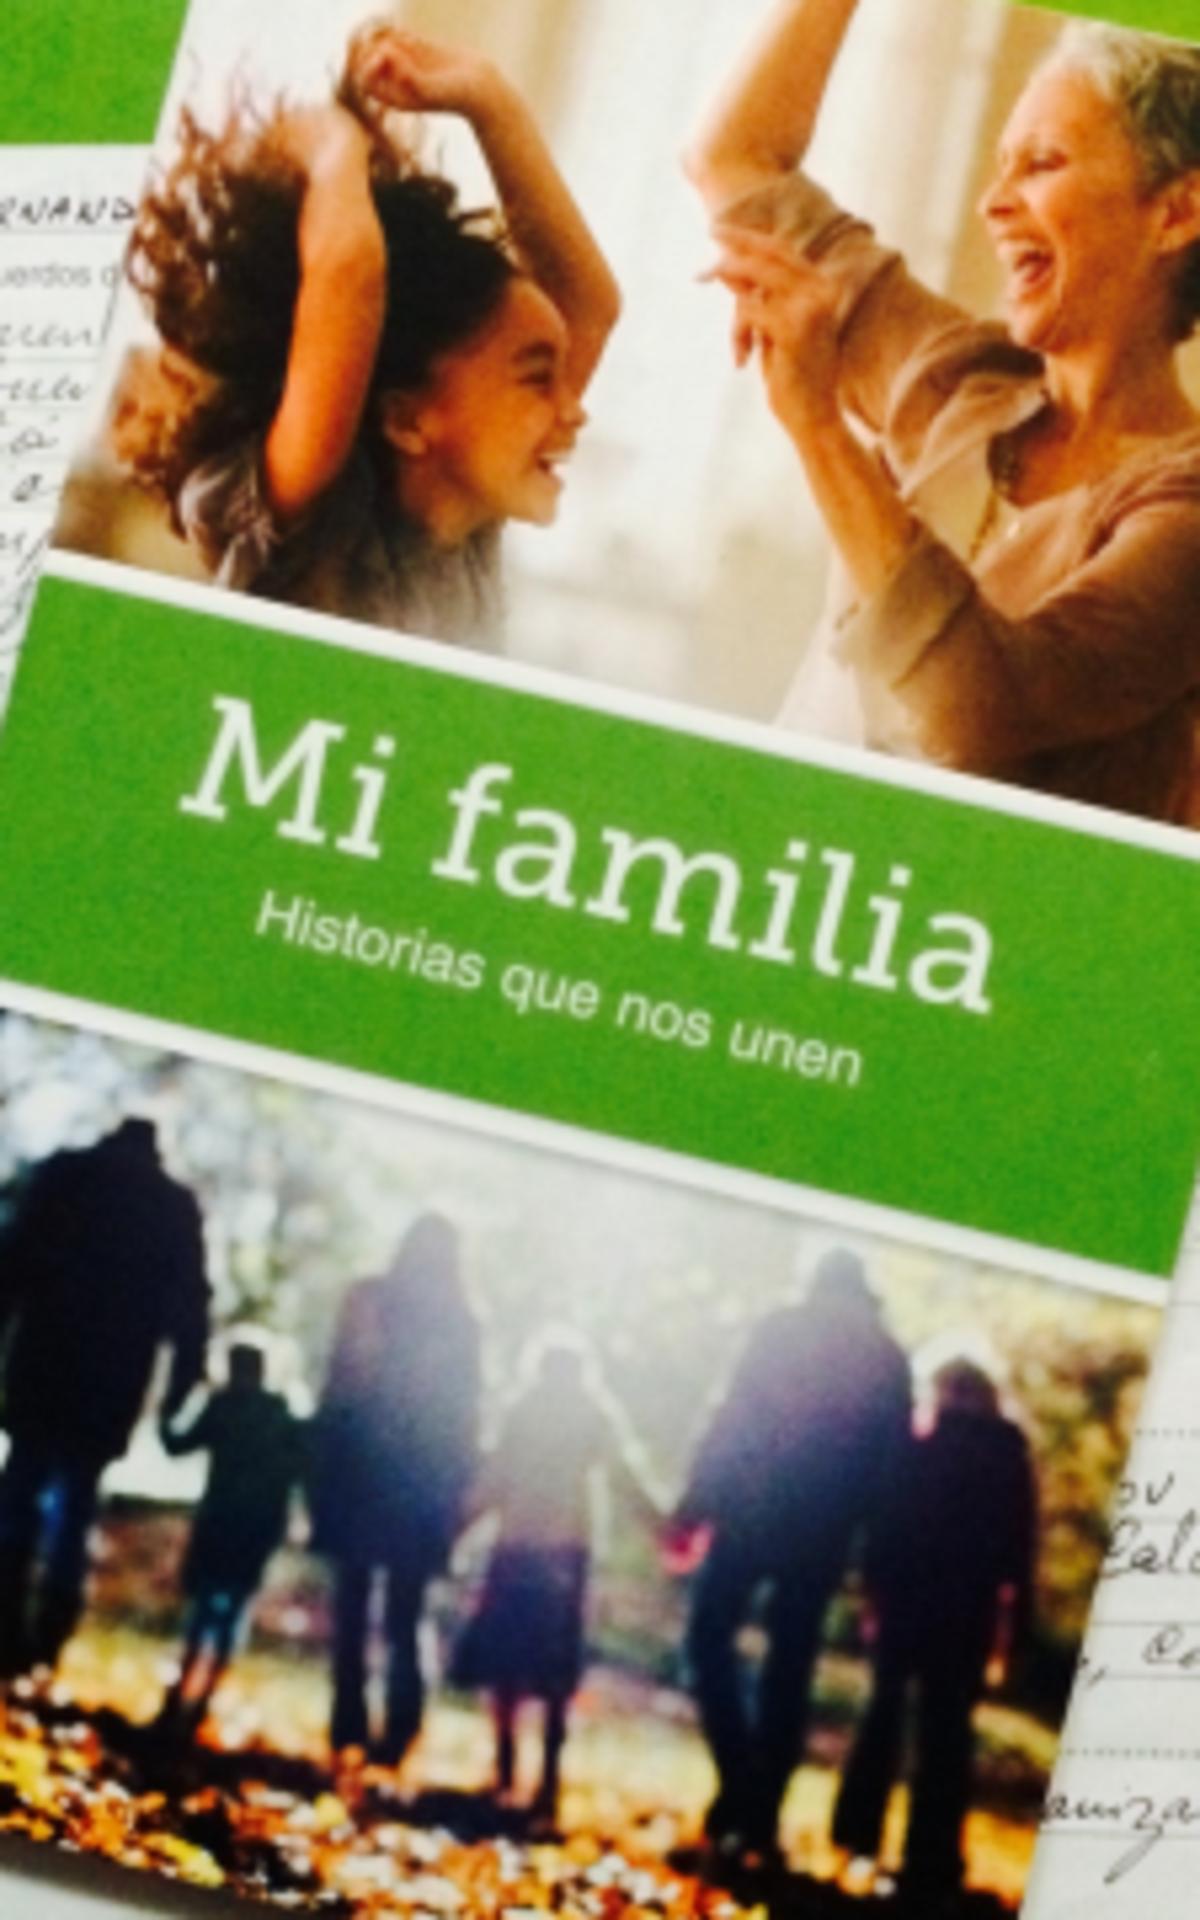 https://familysearch.org/mifamilia